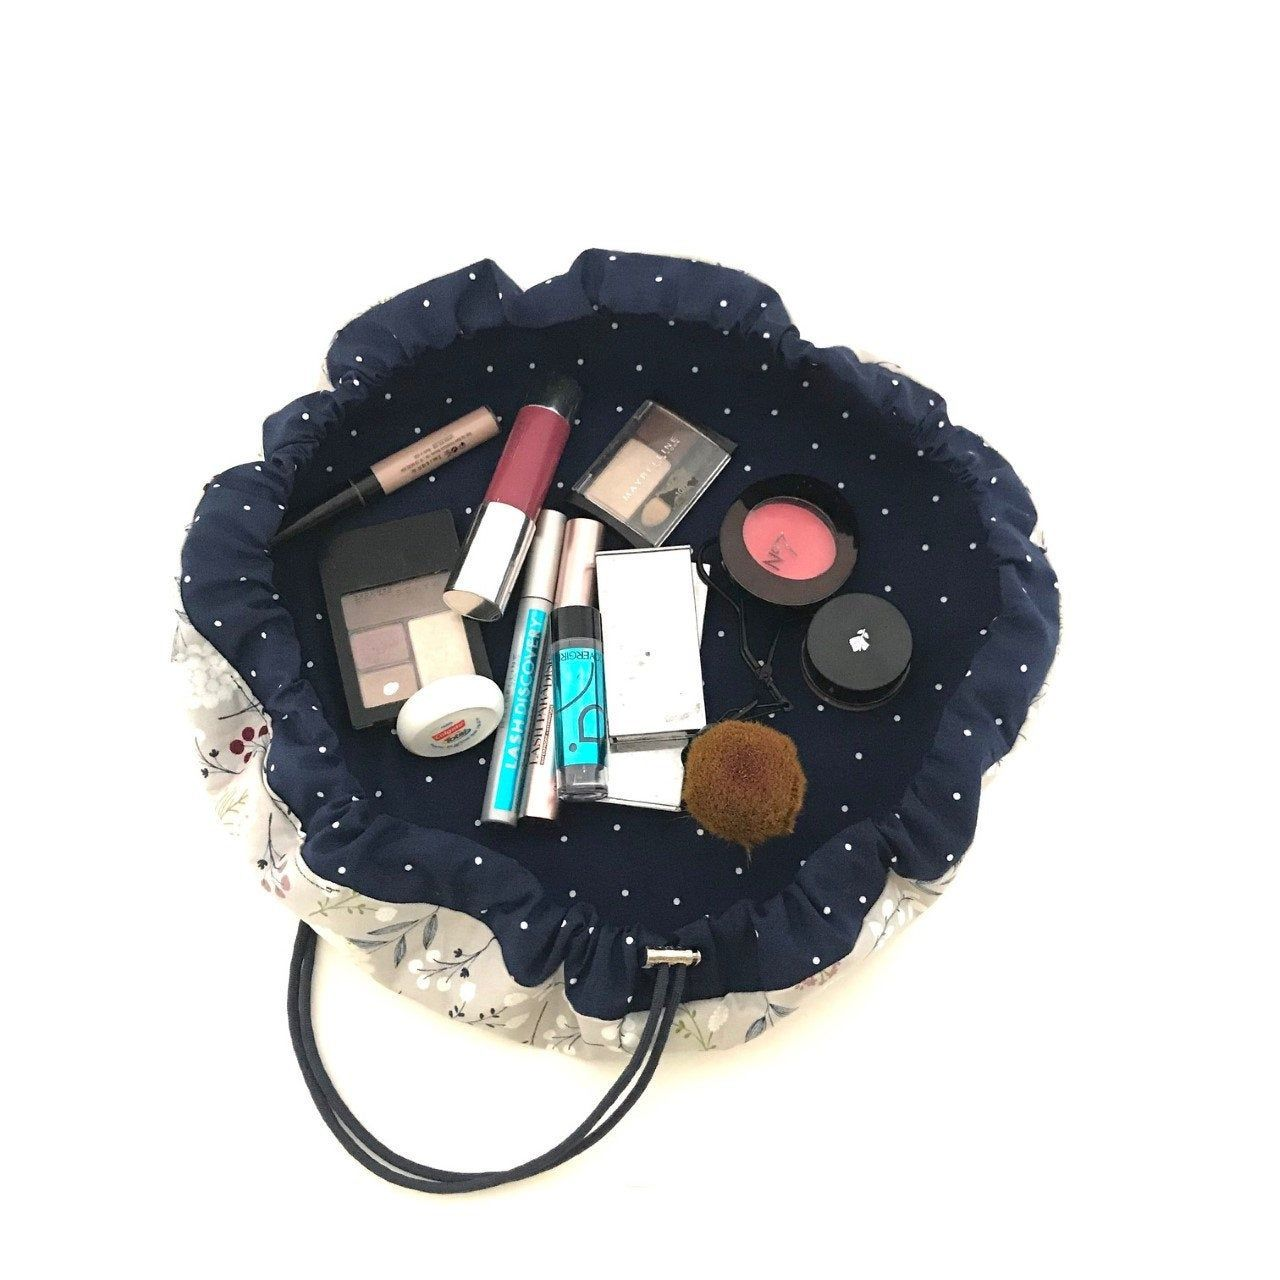 Boho Gray and Blue Cinch Makeup Bag, Washable Drawstring